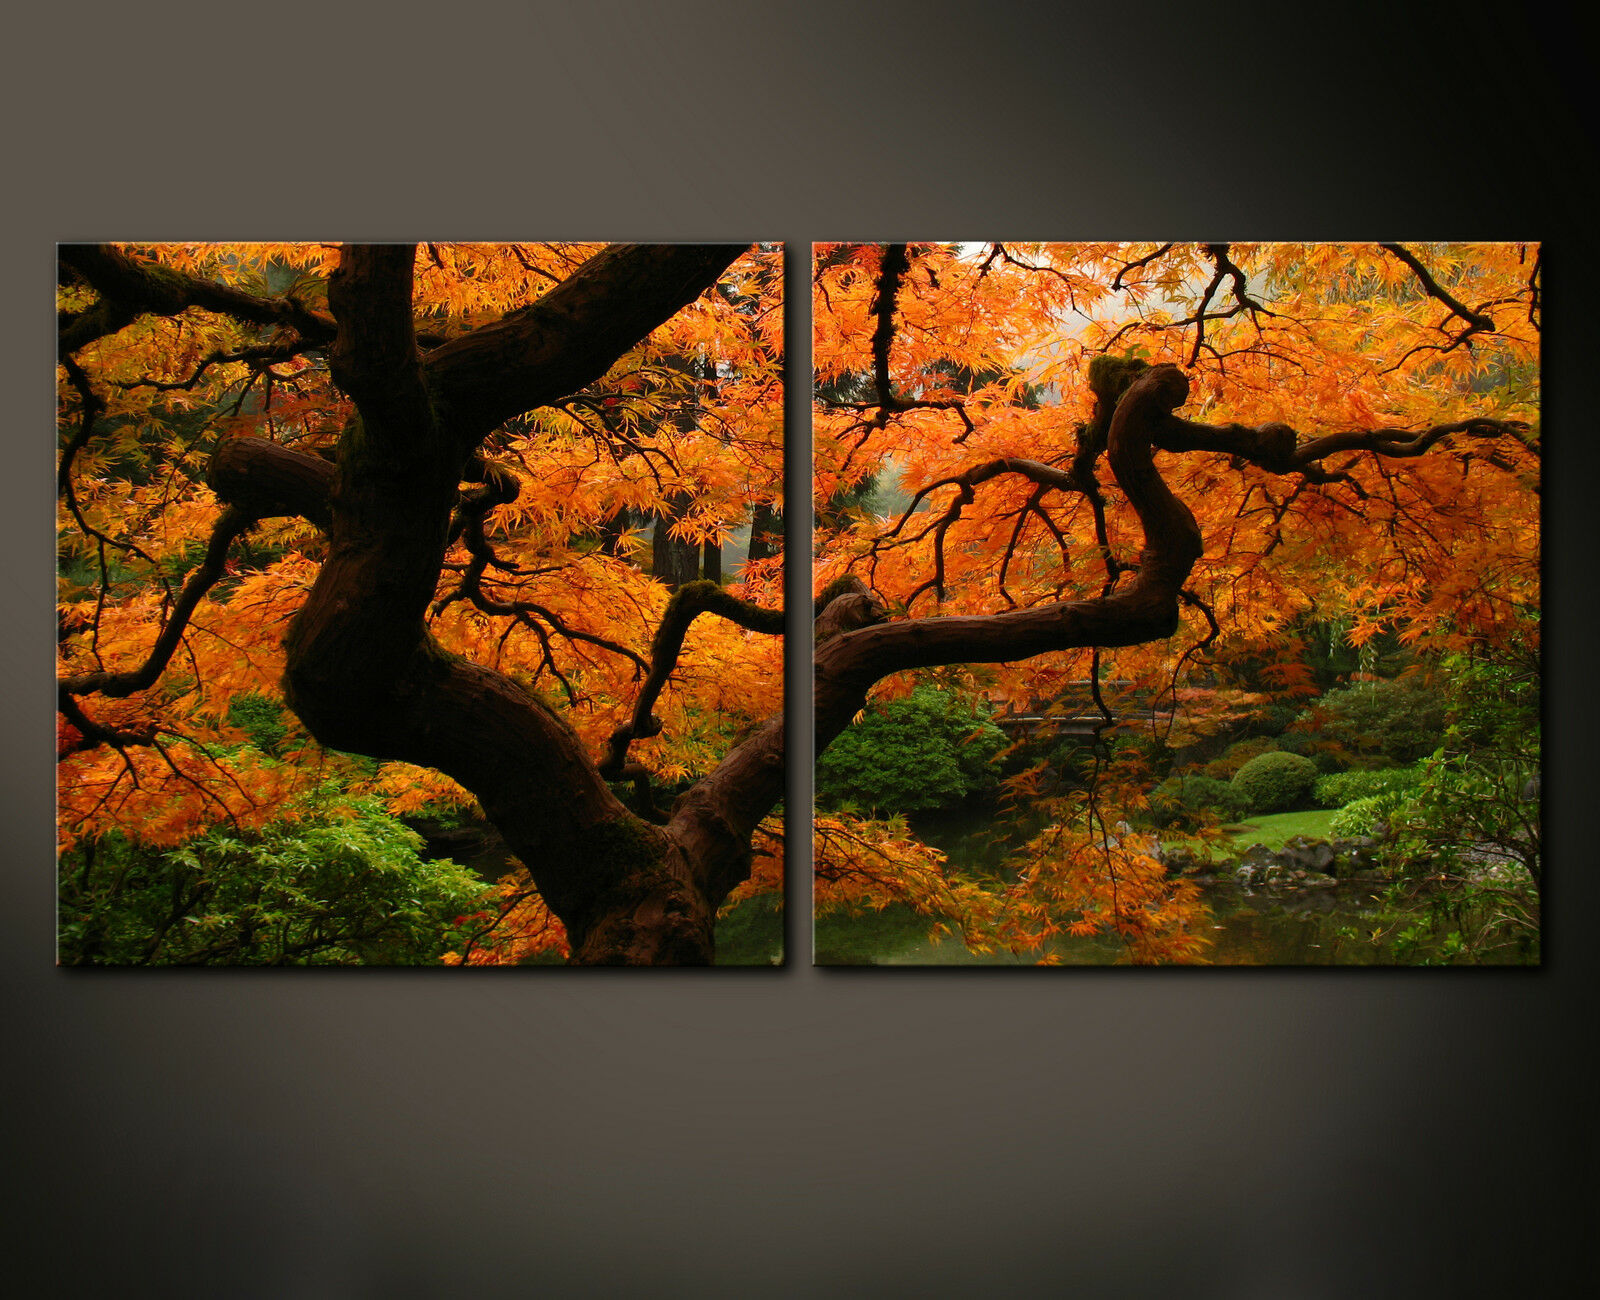 Giapponese Garden Muro Immagine Tela Gelb Arancione rot Giardino XXL